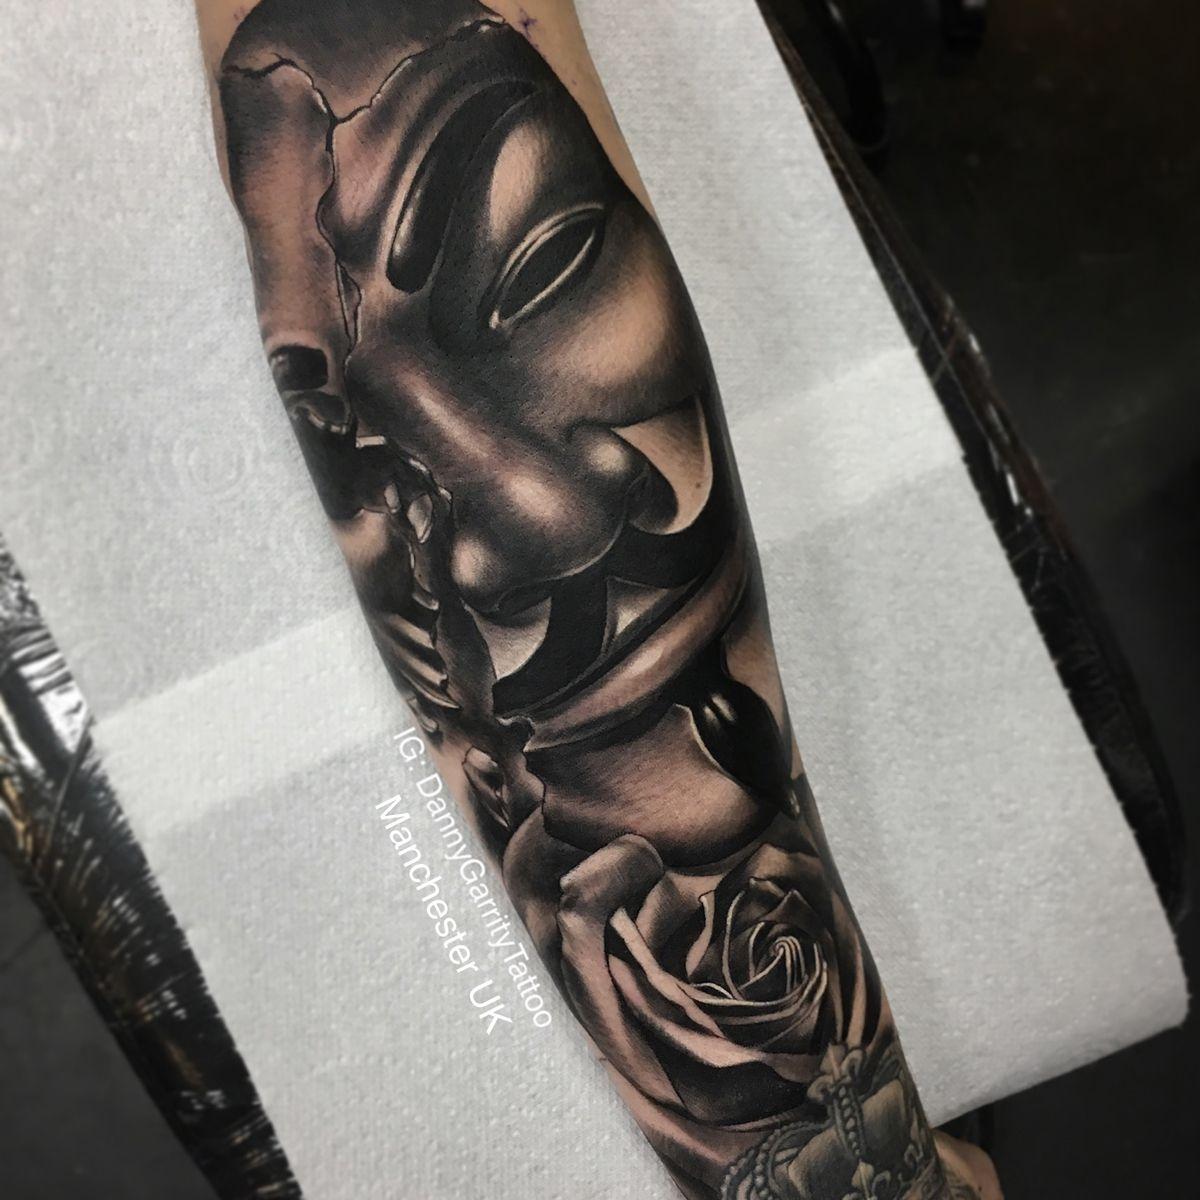 V For Vendetta Tattoo Sleeve Vendetta Tattoo V For Vendetta Tattoo Tattoos